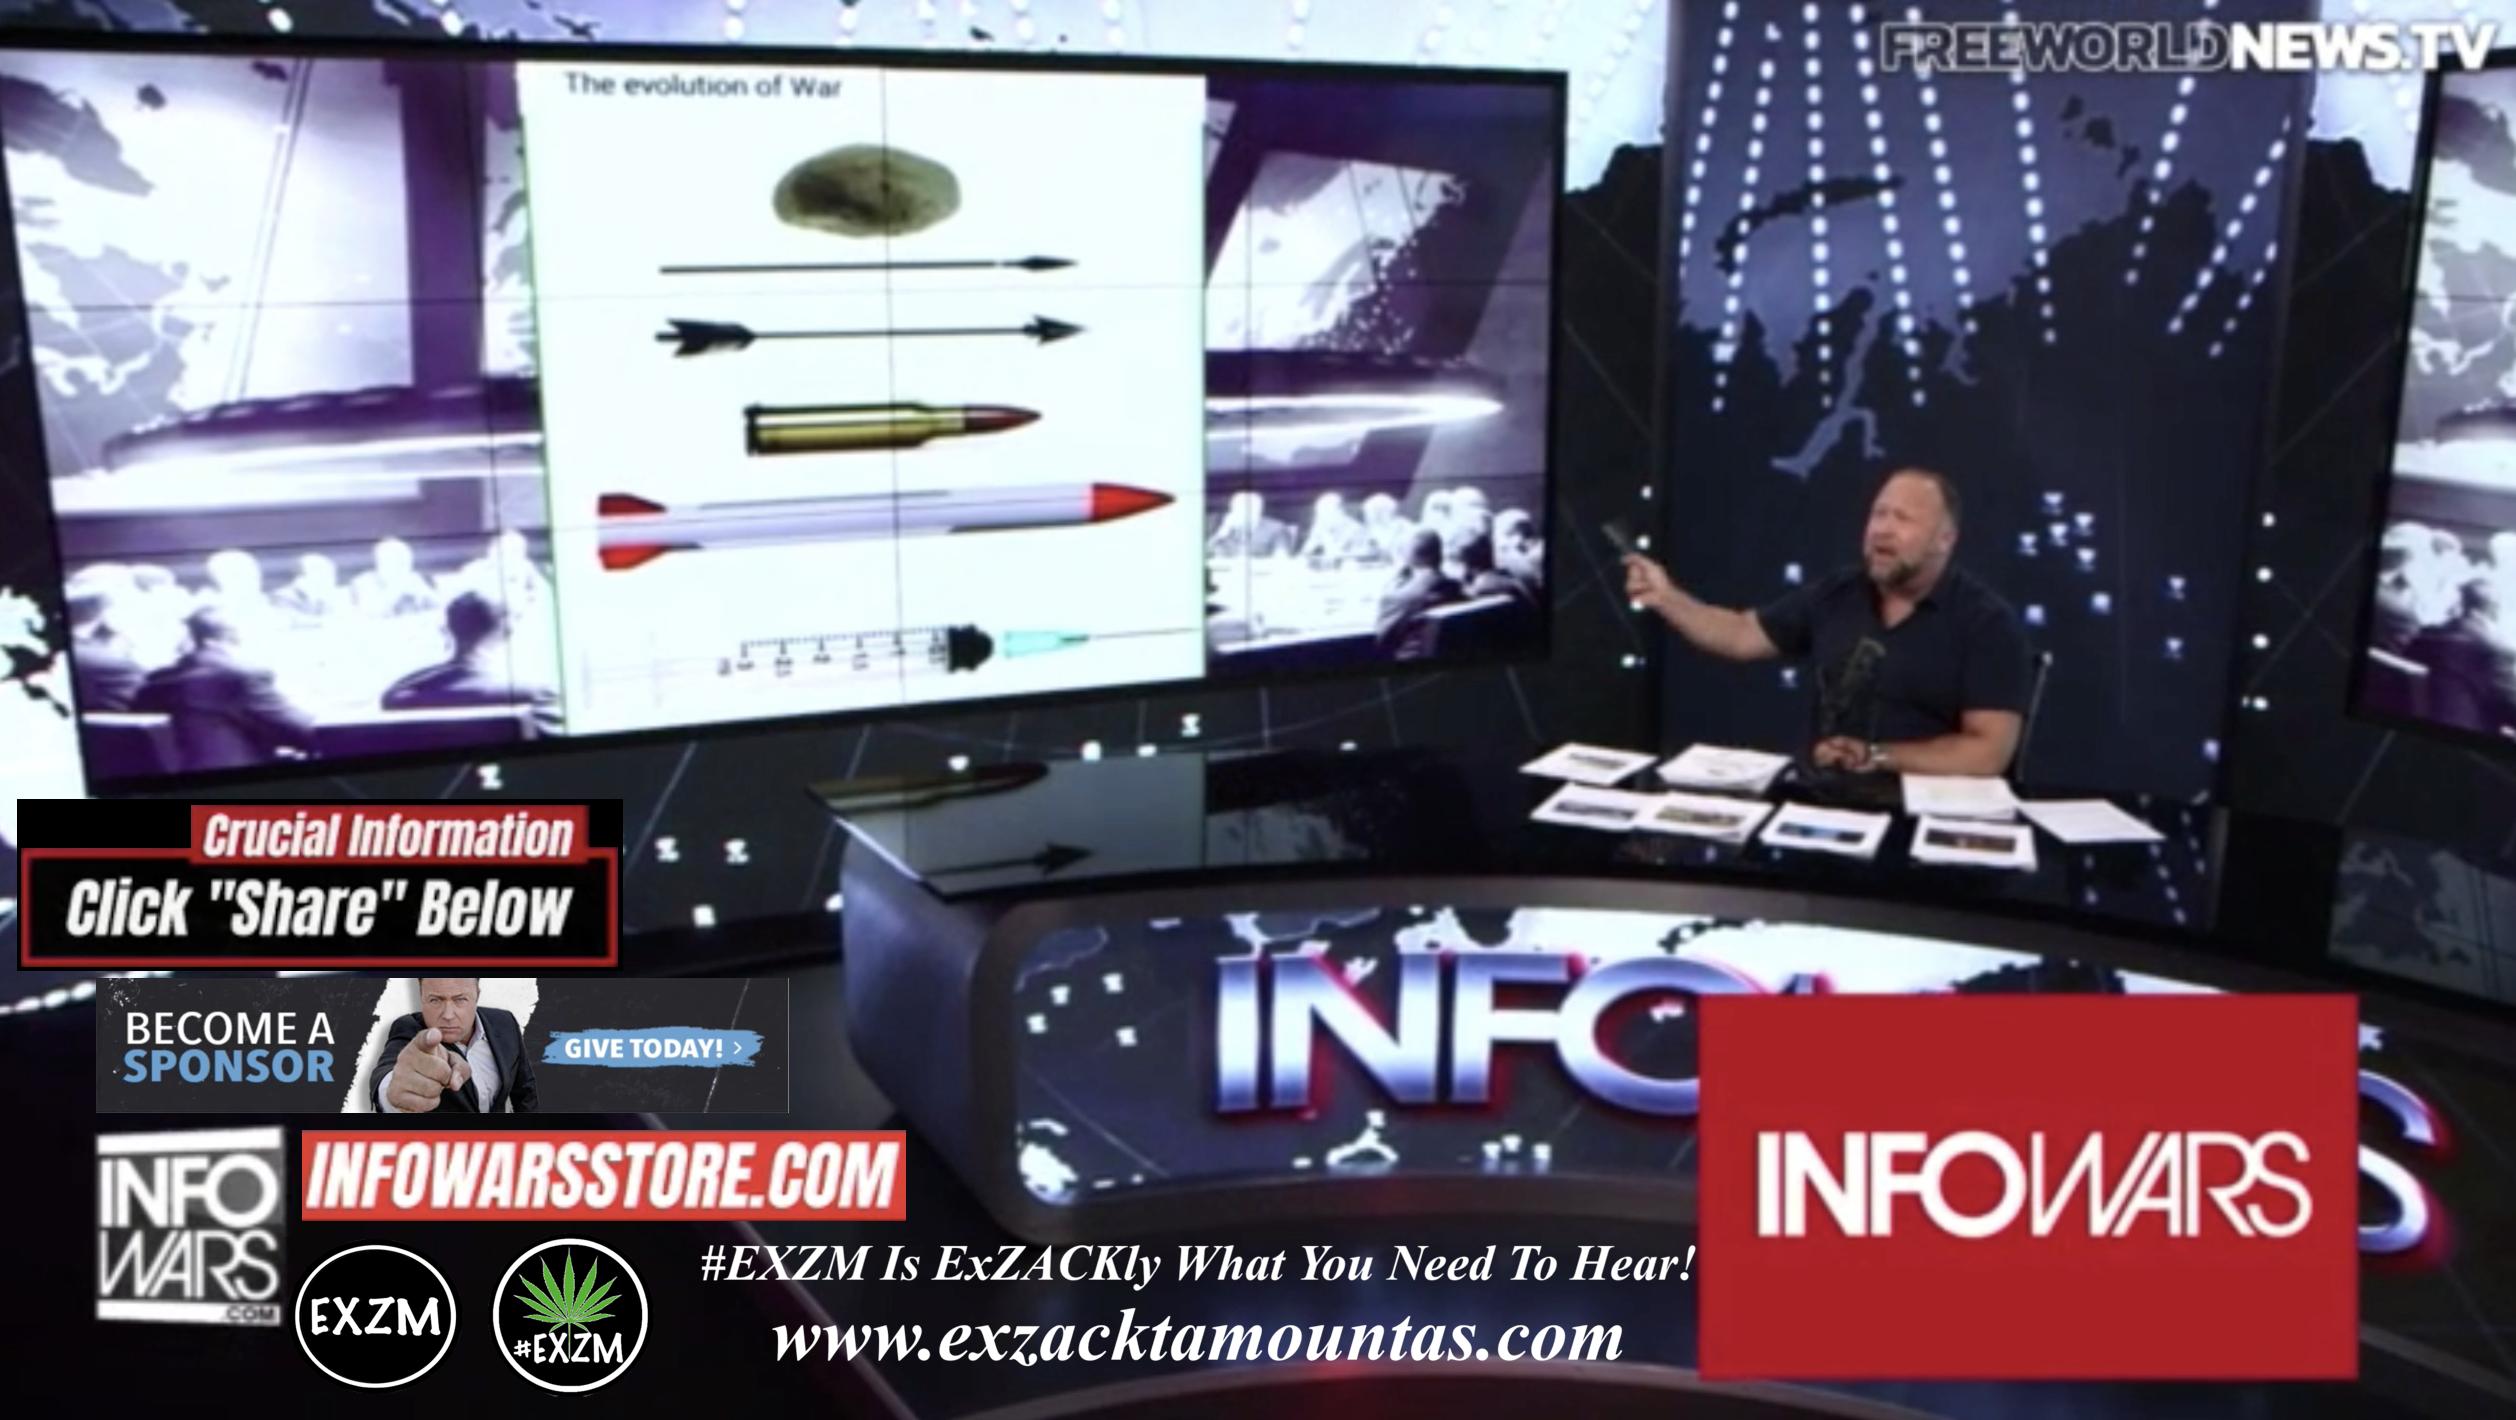 Alex Jones Live In Infowars Studio Free World News TV EXZM Zack Mount October 24th 2021 copy